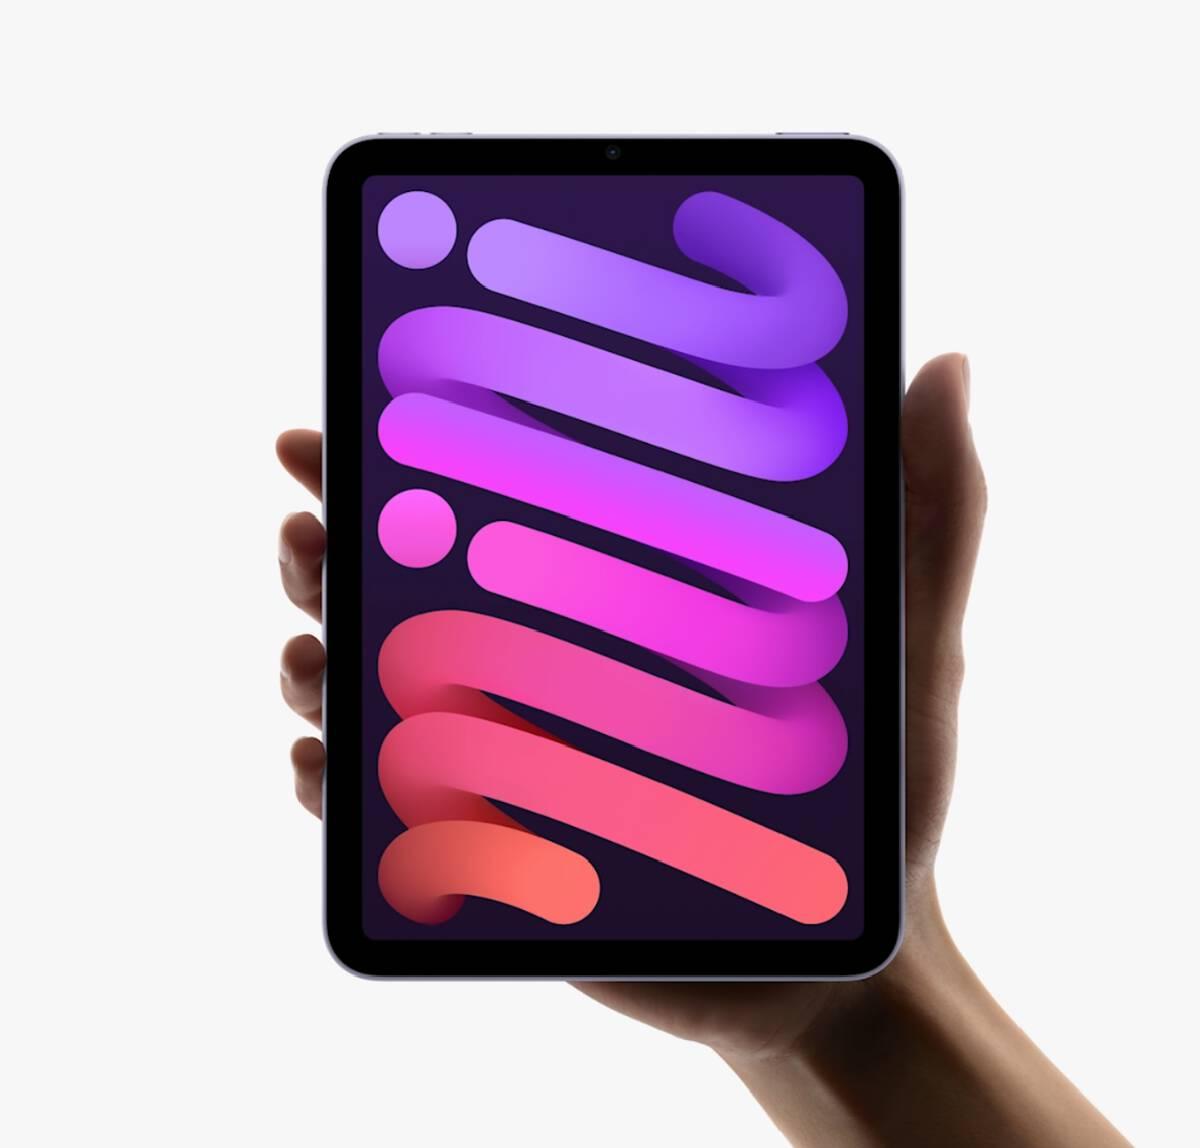 Apple เผยโฉม iPad mini  จอใหญ่ดีไซน์ใหม่ 4 สีสันสวยงาม ราคาเริ่มต้น 17,900 บาท